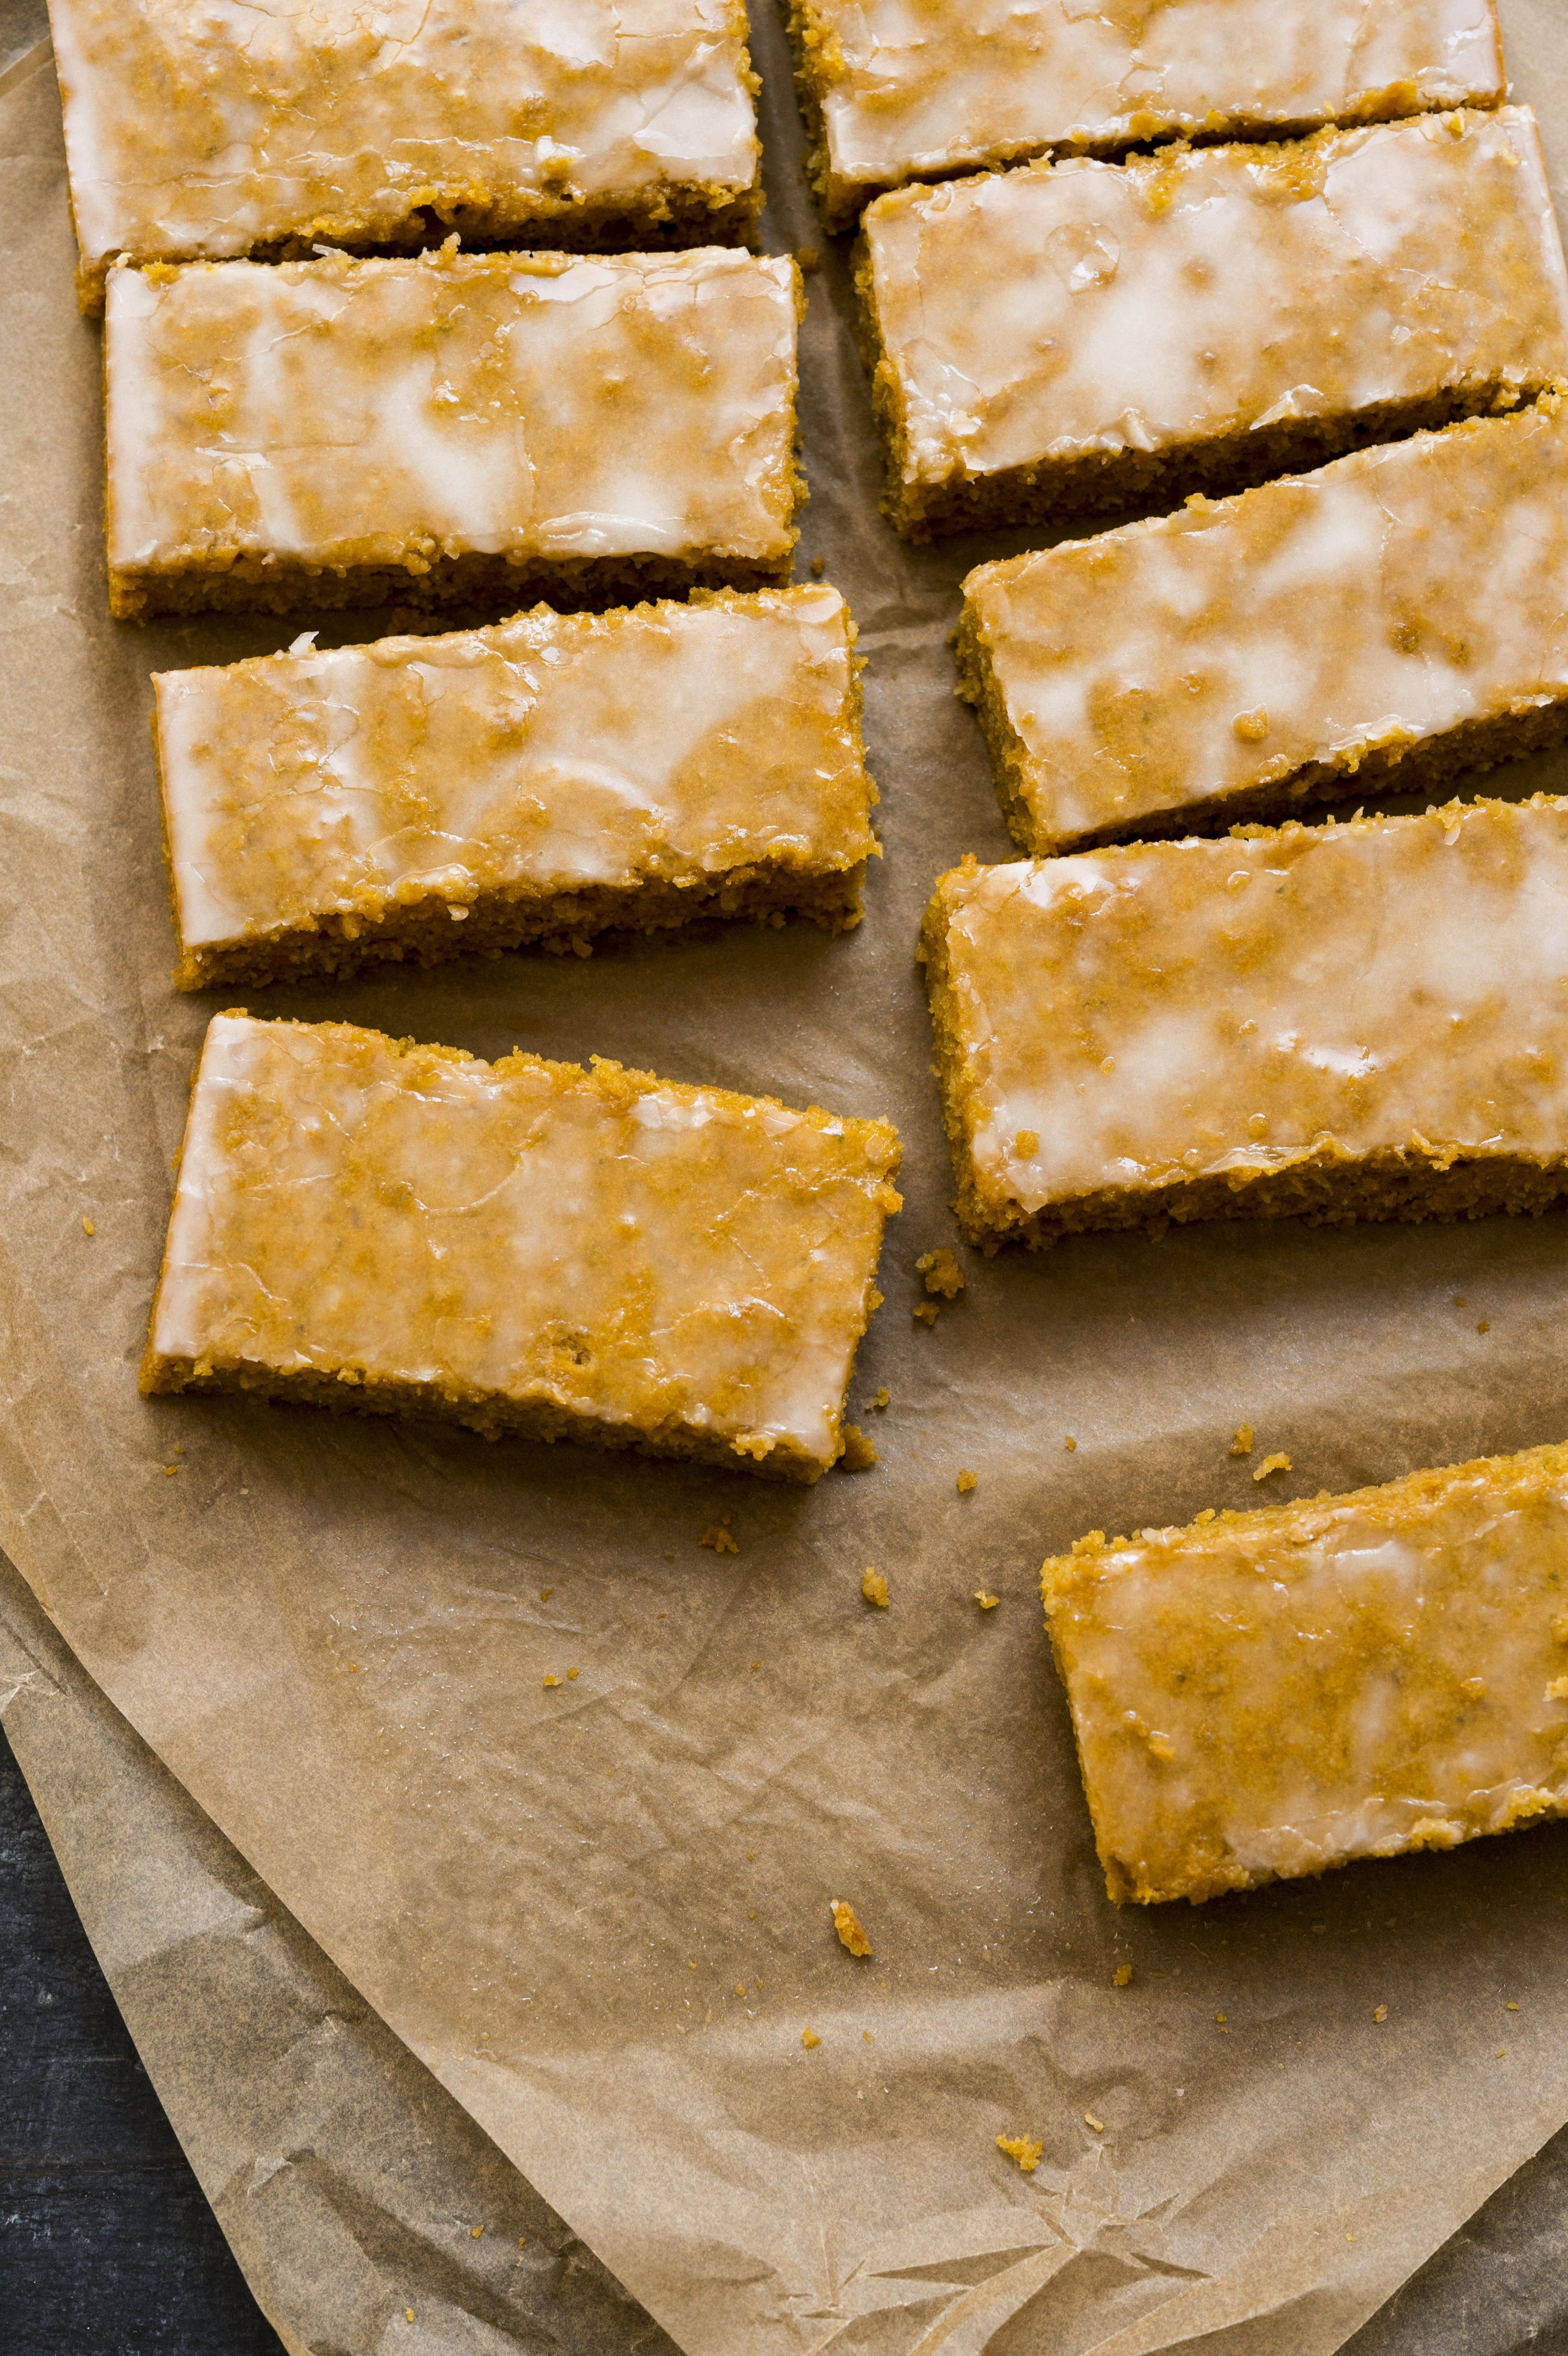 Macanese Sweet Potato Cake (Batatada)